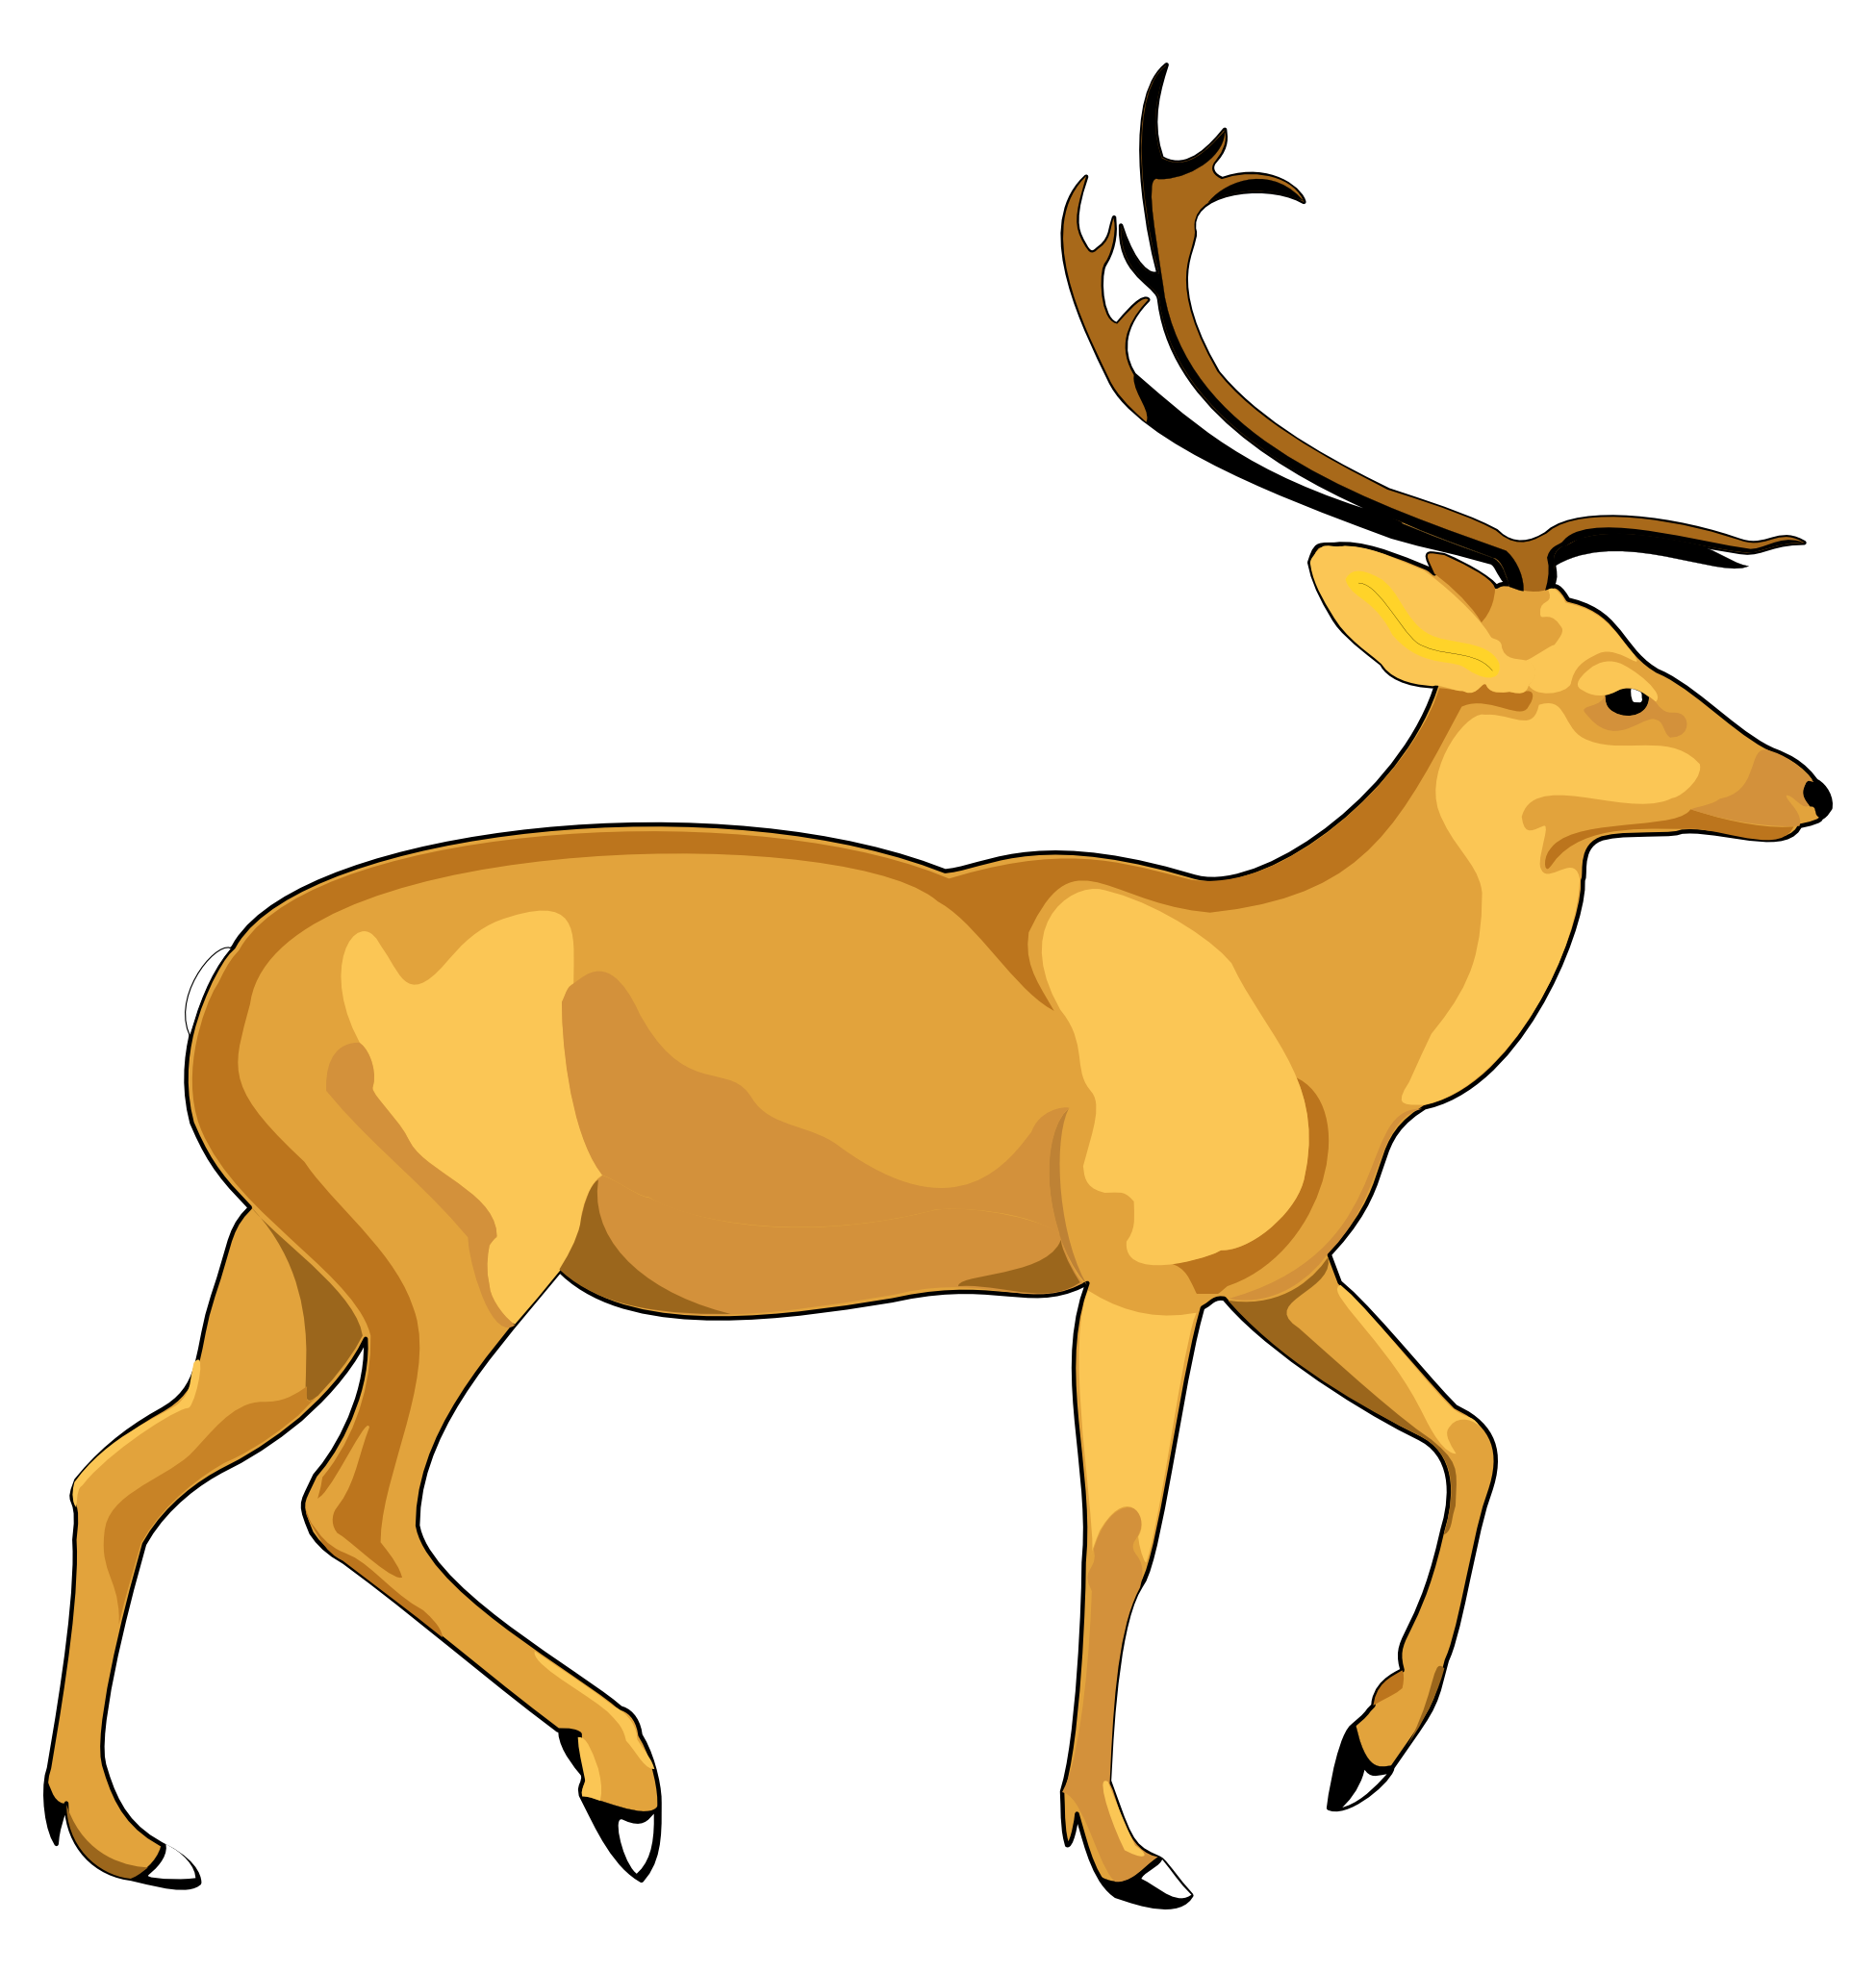 1950x2050 Deer Png Images